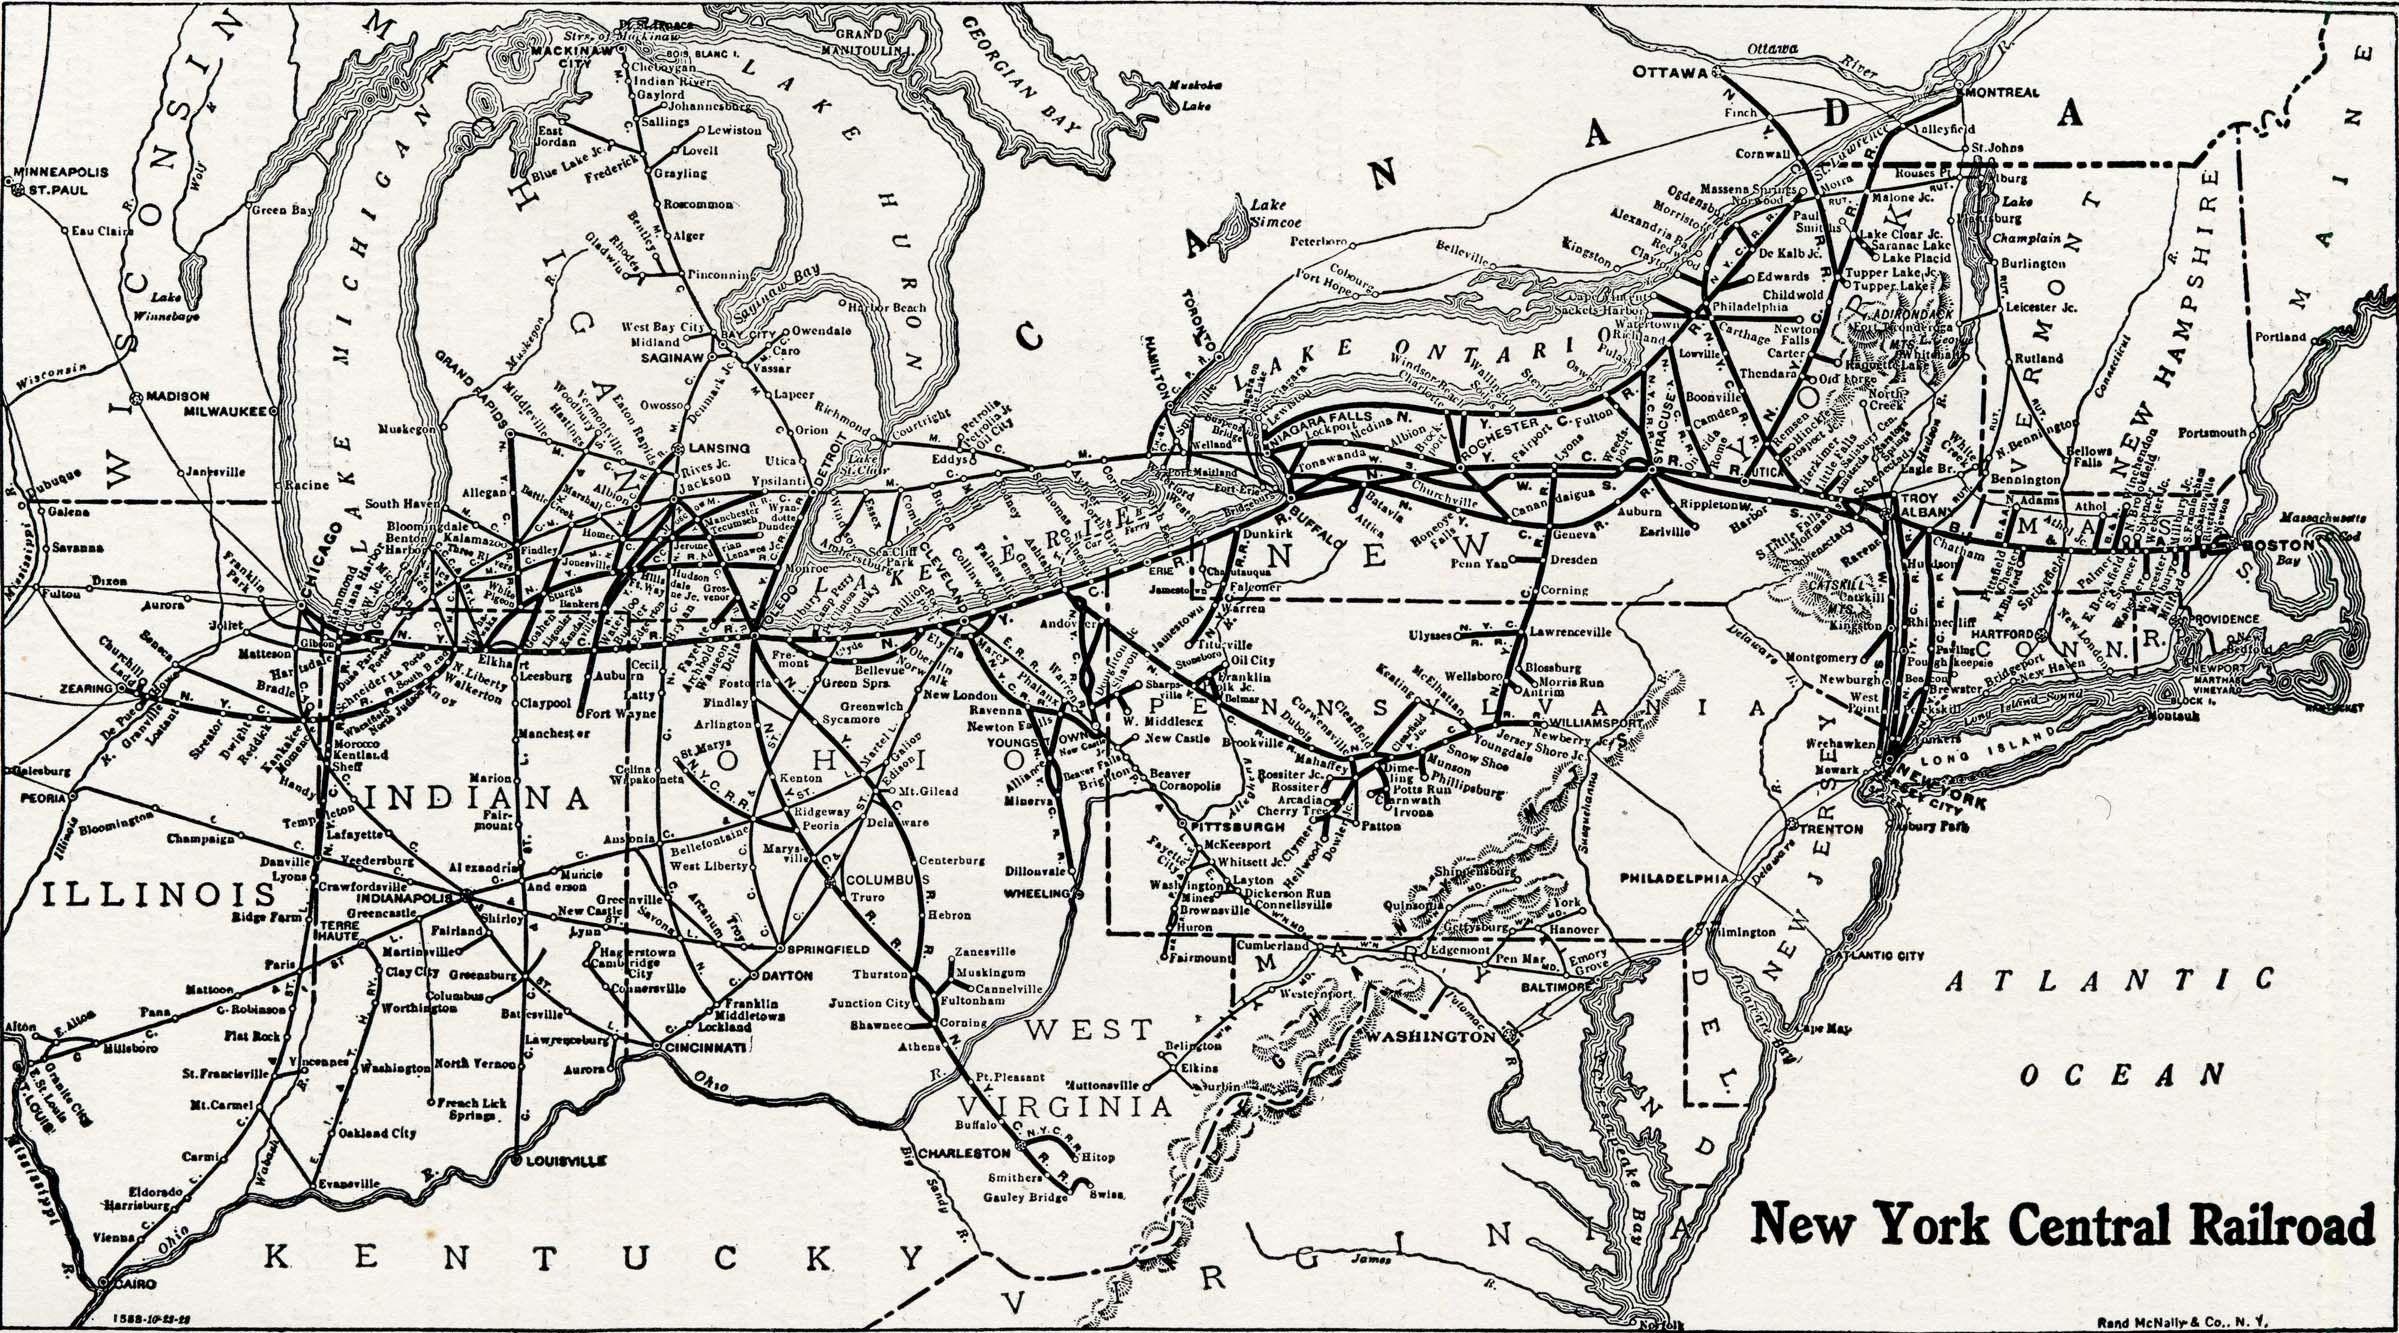 18x24 Vintage Reproduction Railroad Rail Train Historic Map Texas 1900